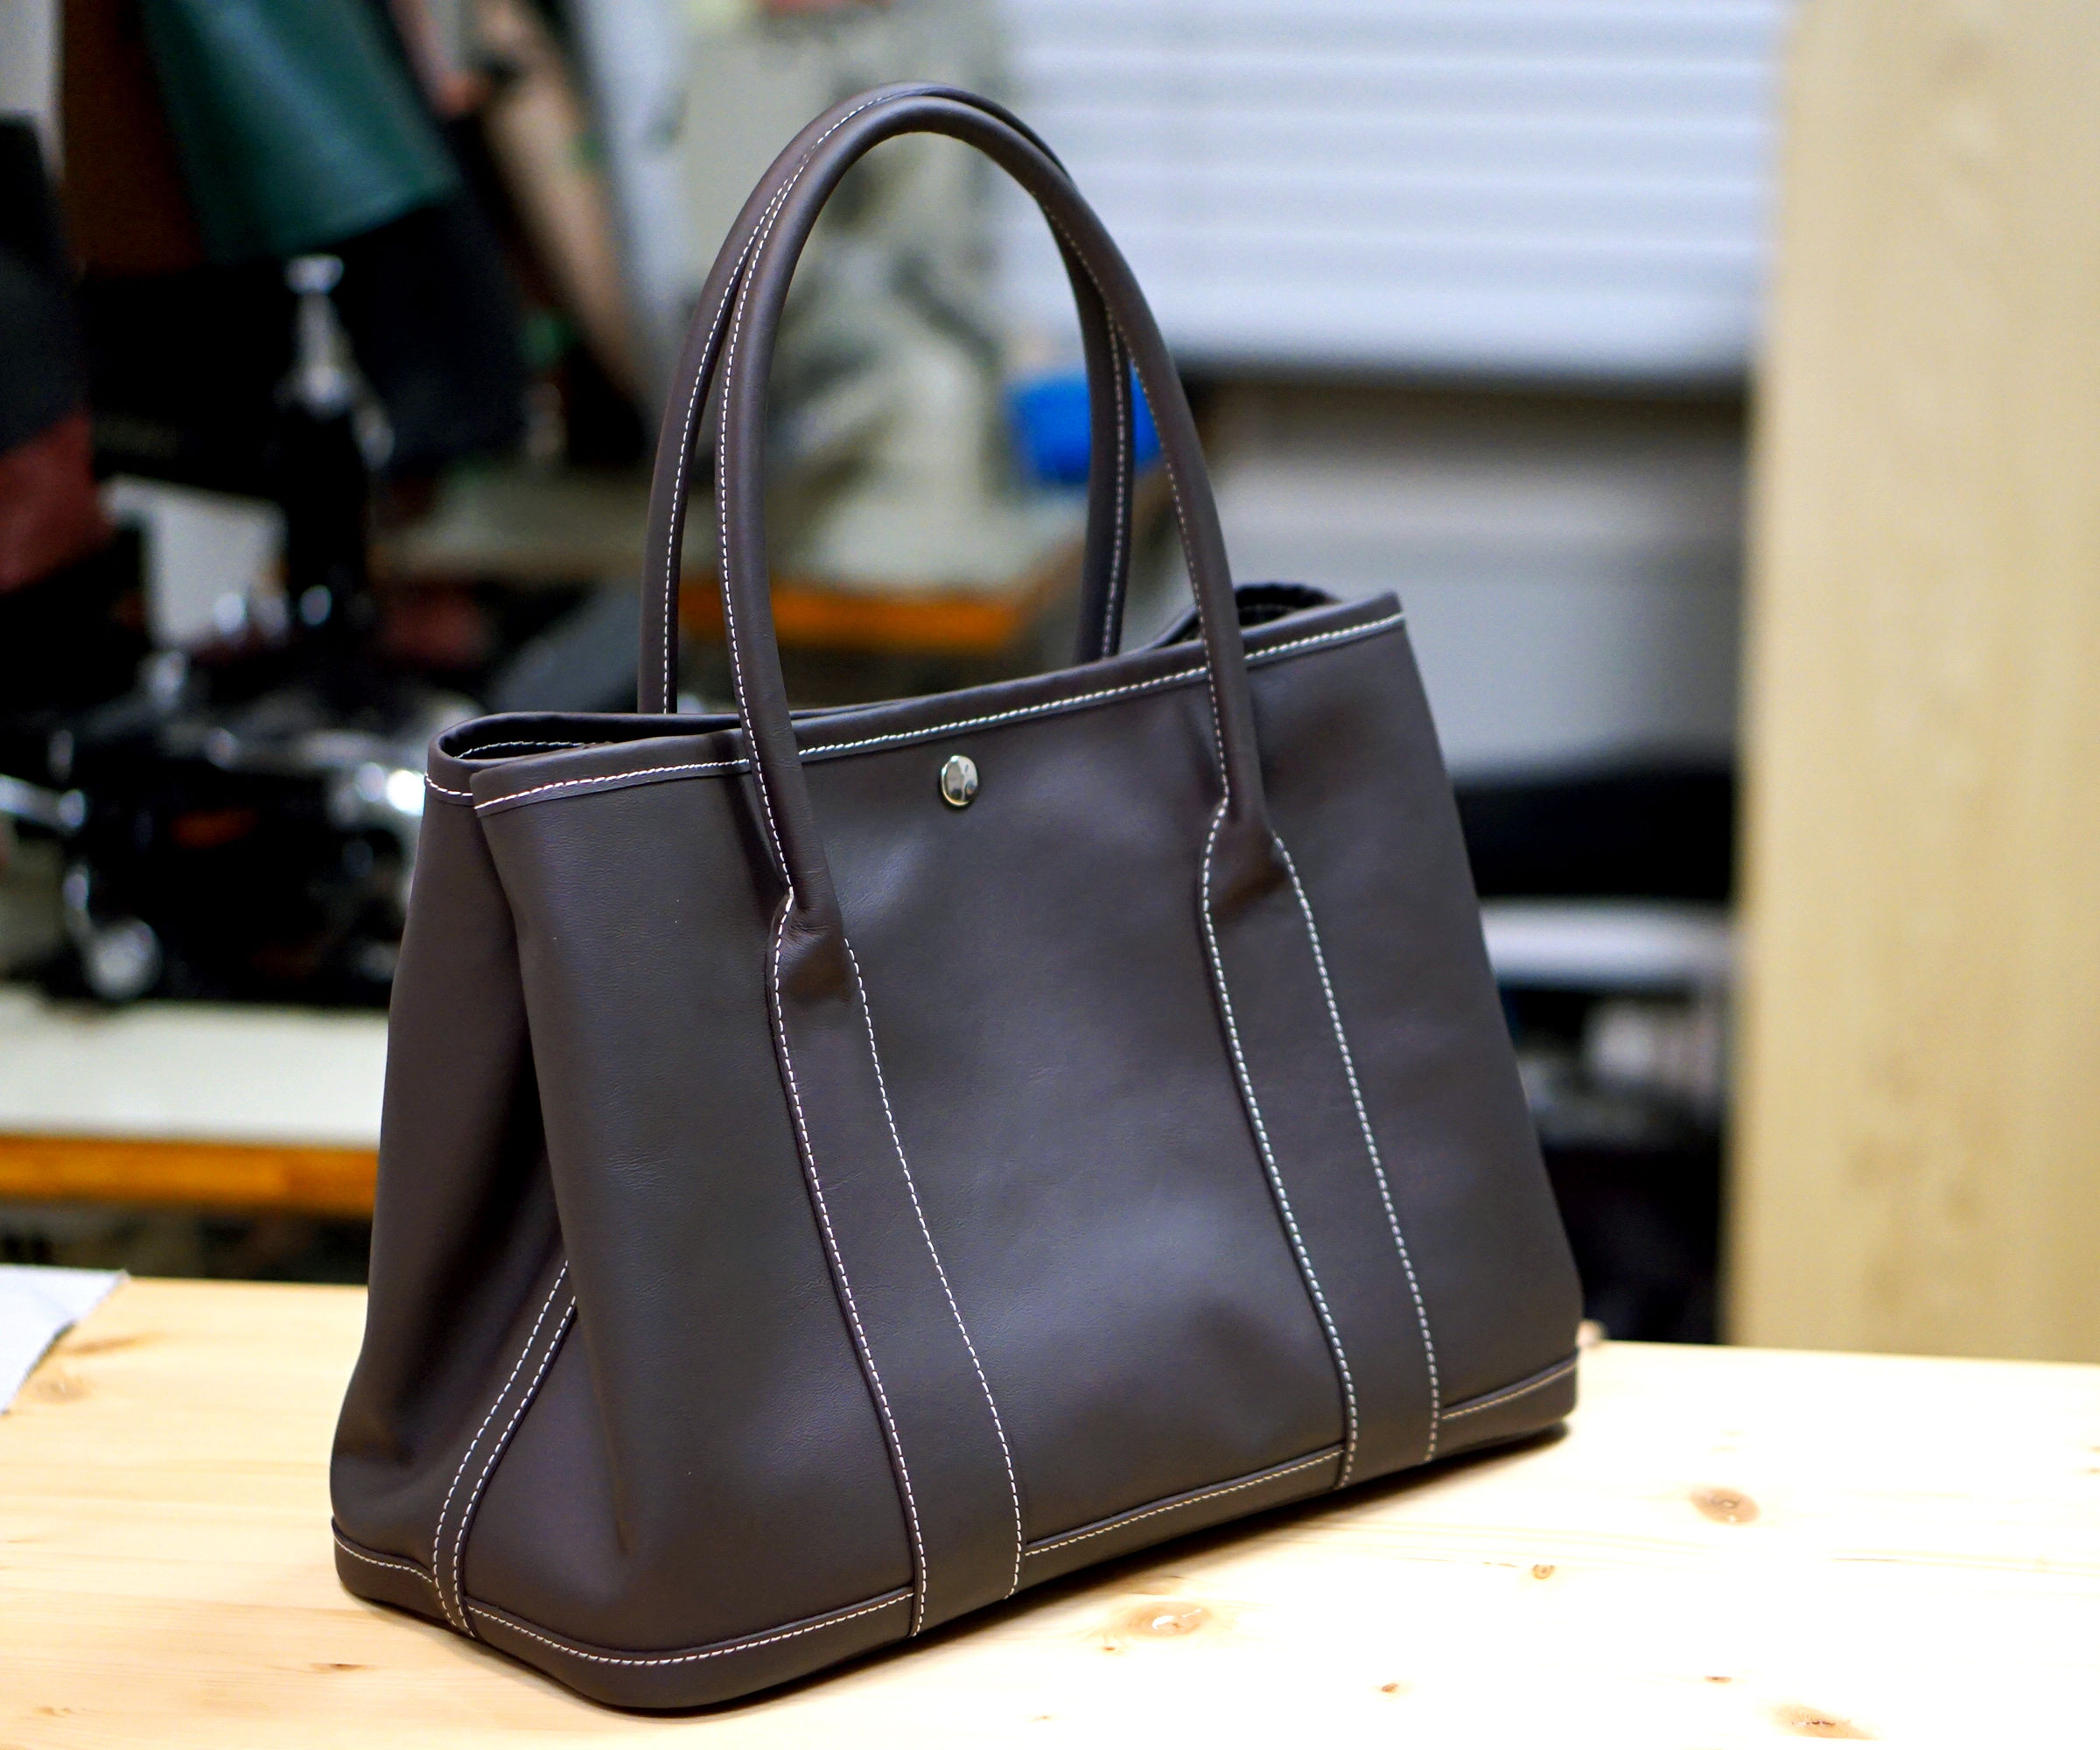 Making a Shopper Bag